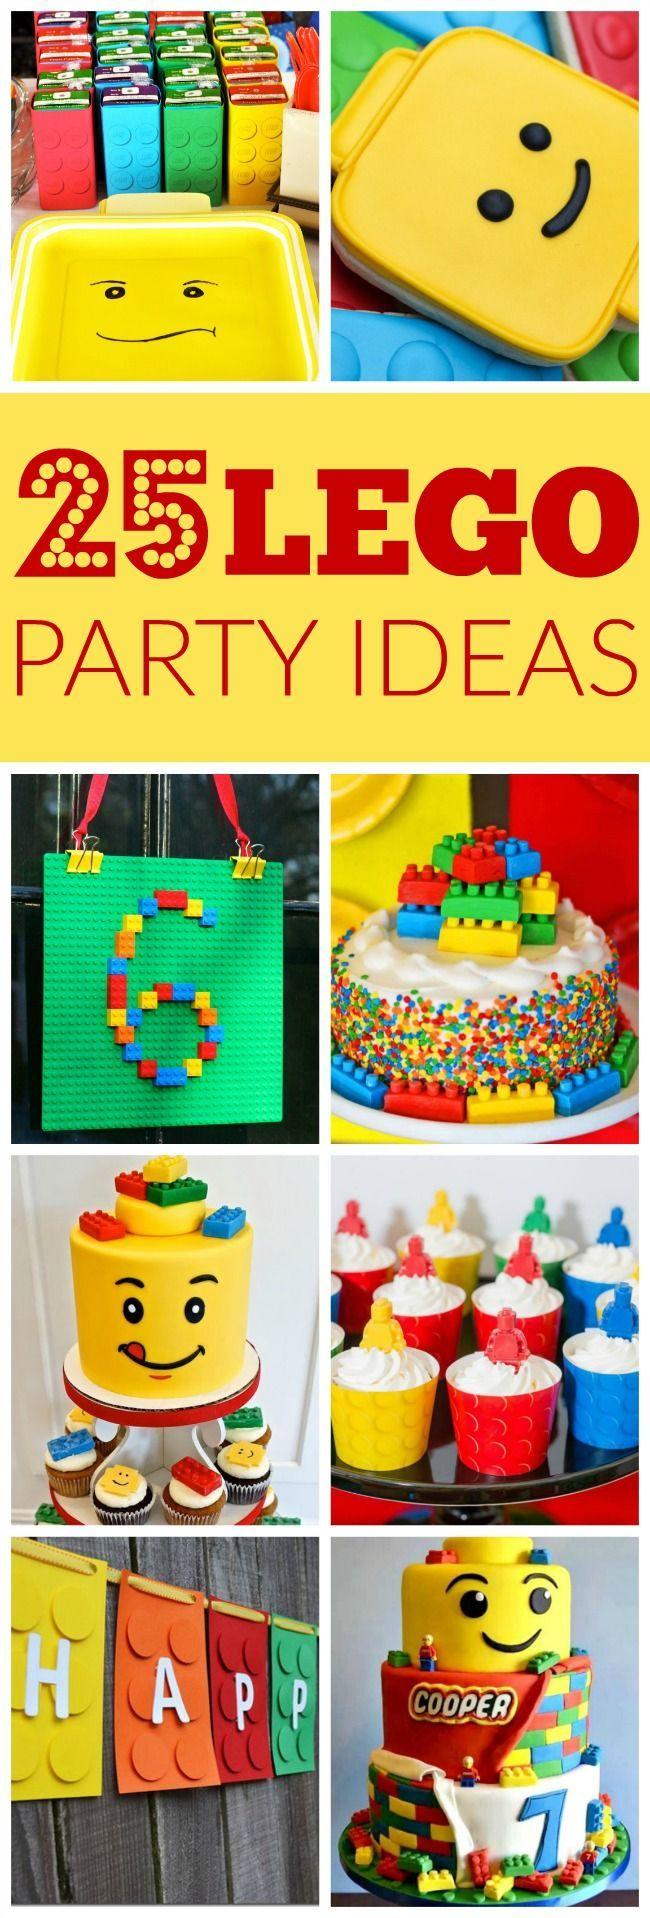 25 Lego Themed Party Ideas